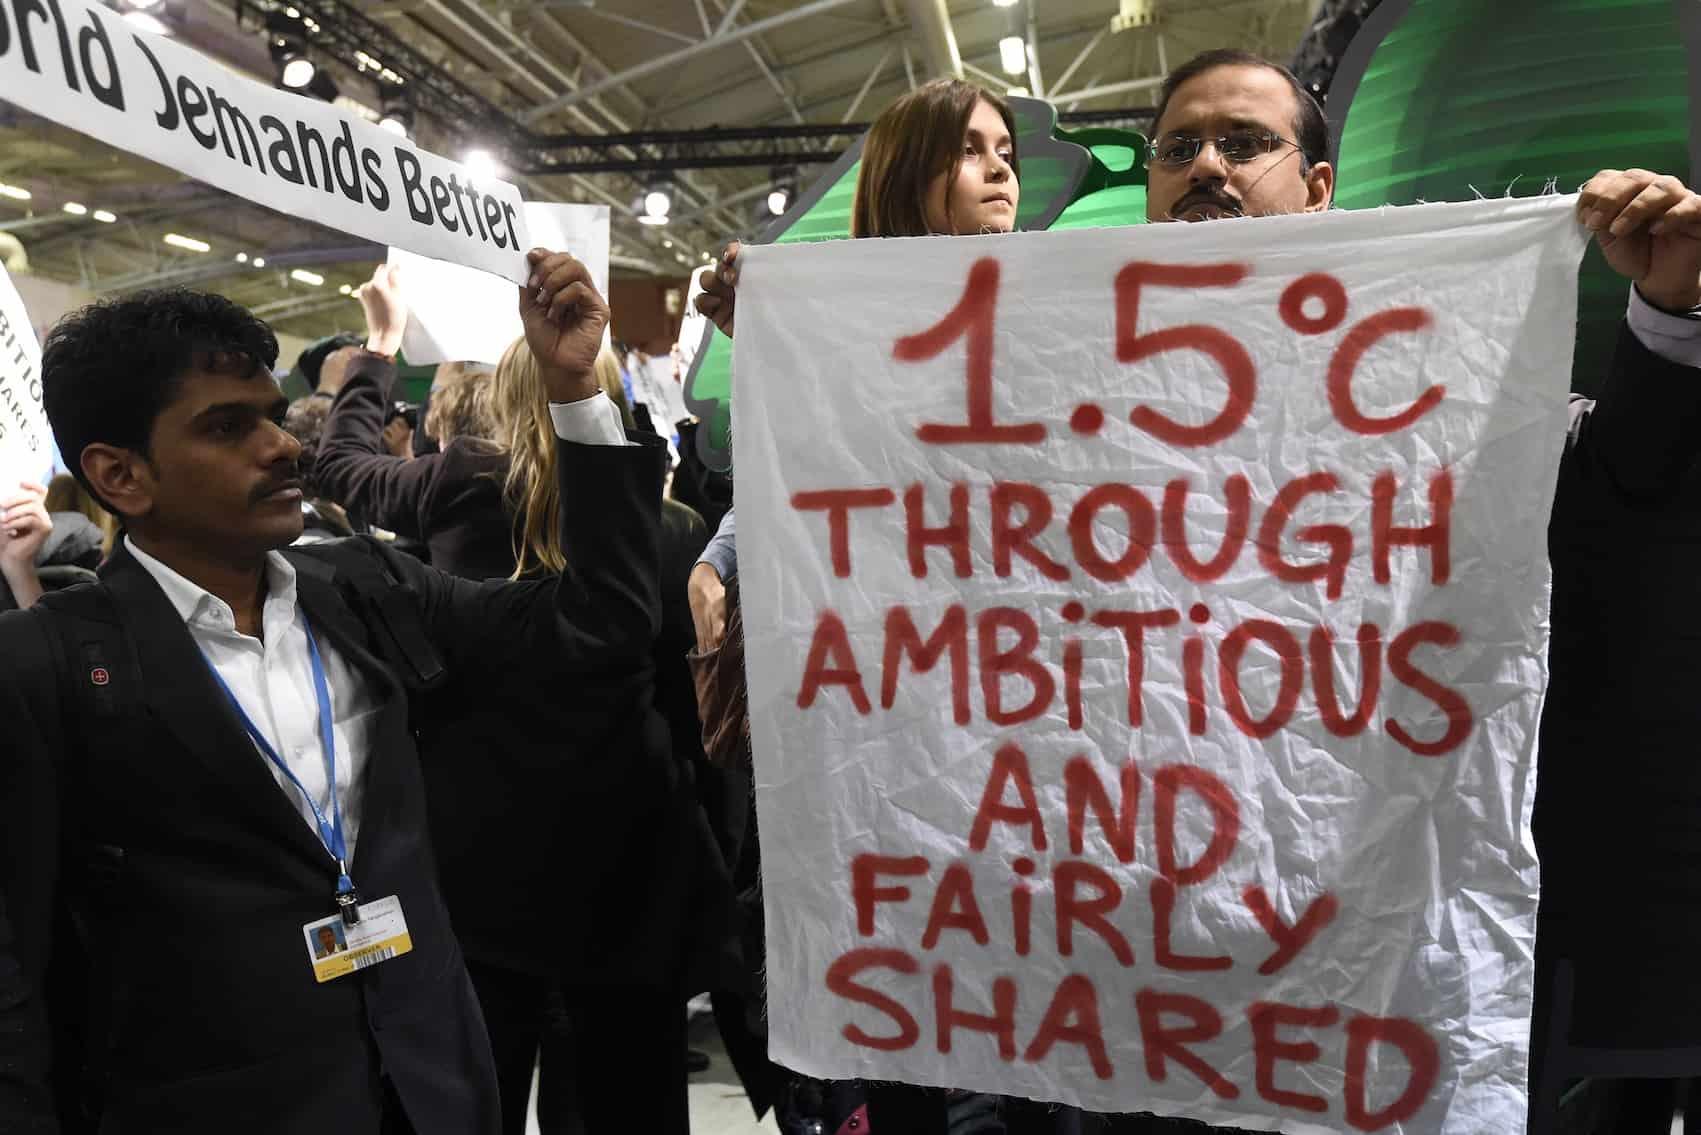 UN climate pact: 1.5 C poster